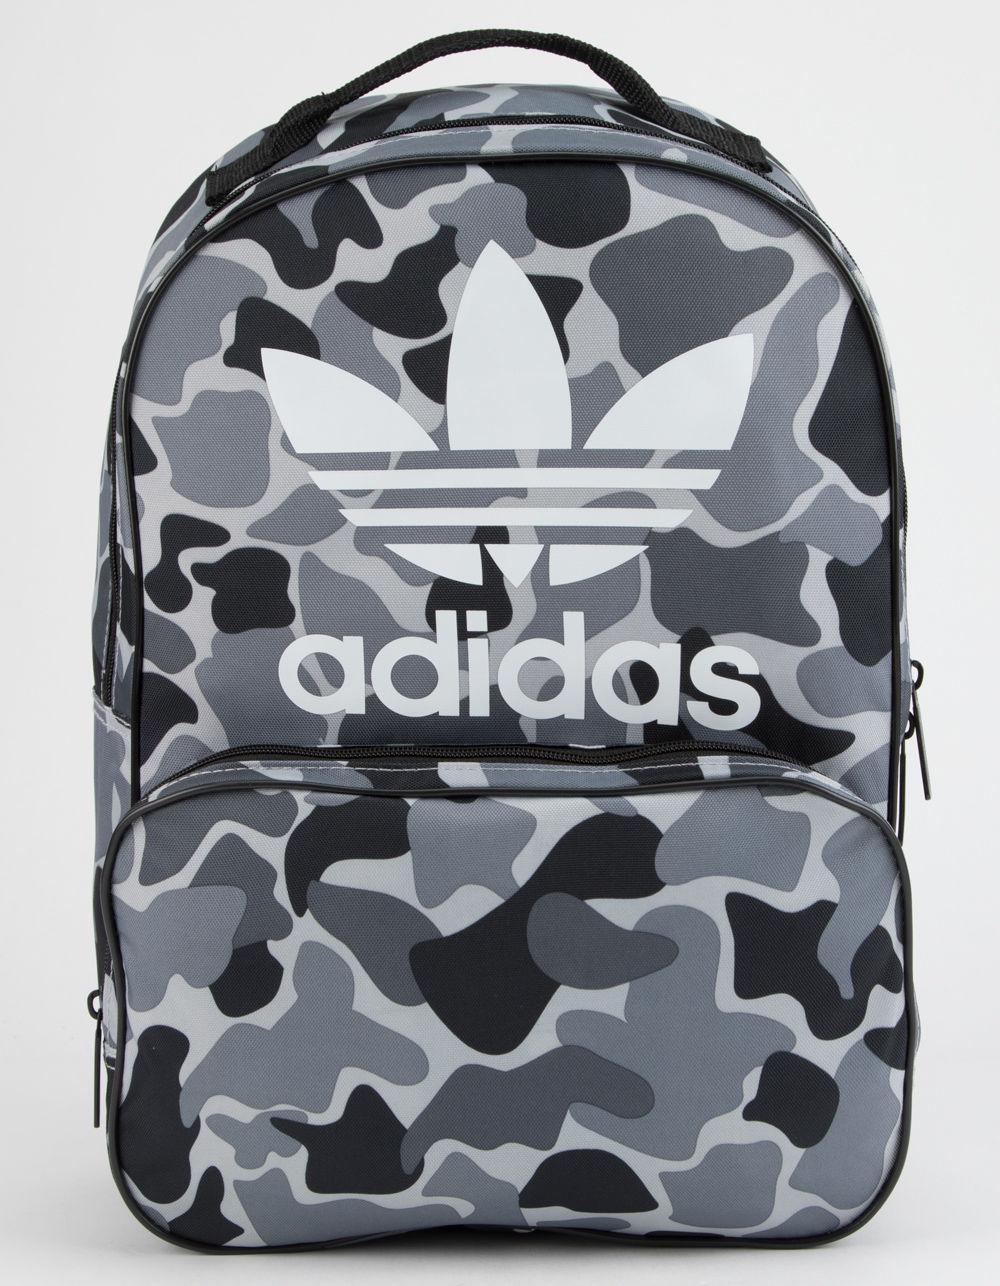 08a3ed142f49 Lyst - adidas Originals Santiago Black Camo Backpack in Black for Men